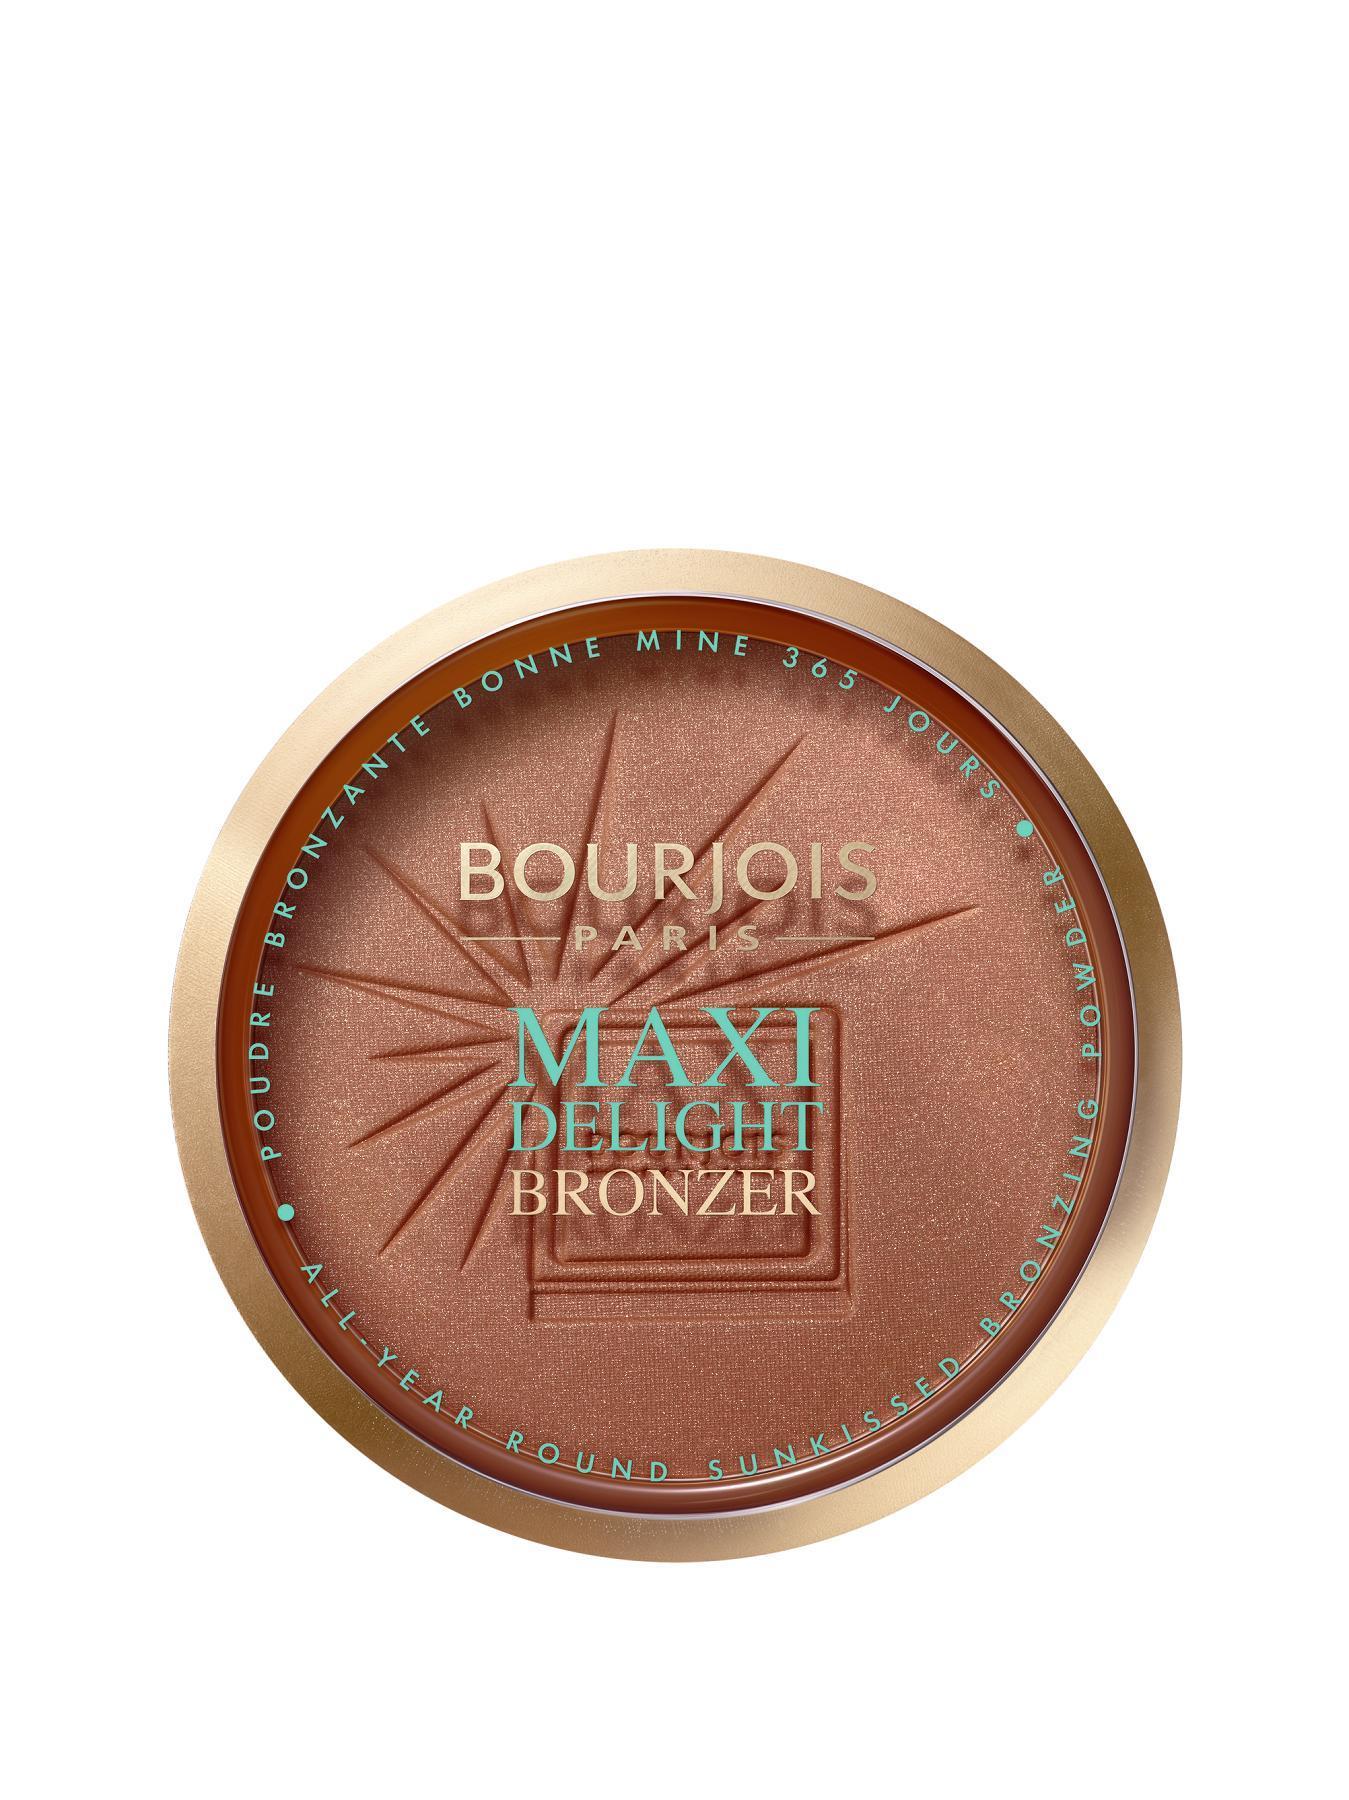 Bourjois Maxi Delight Bronzer & FREE Compact Mirror*